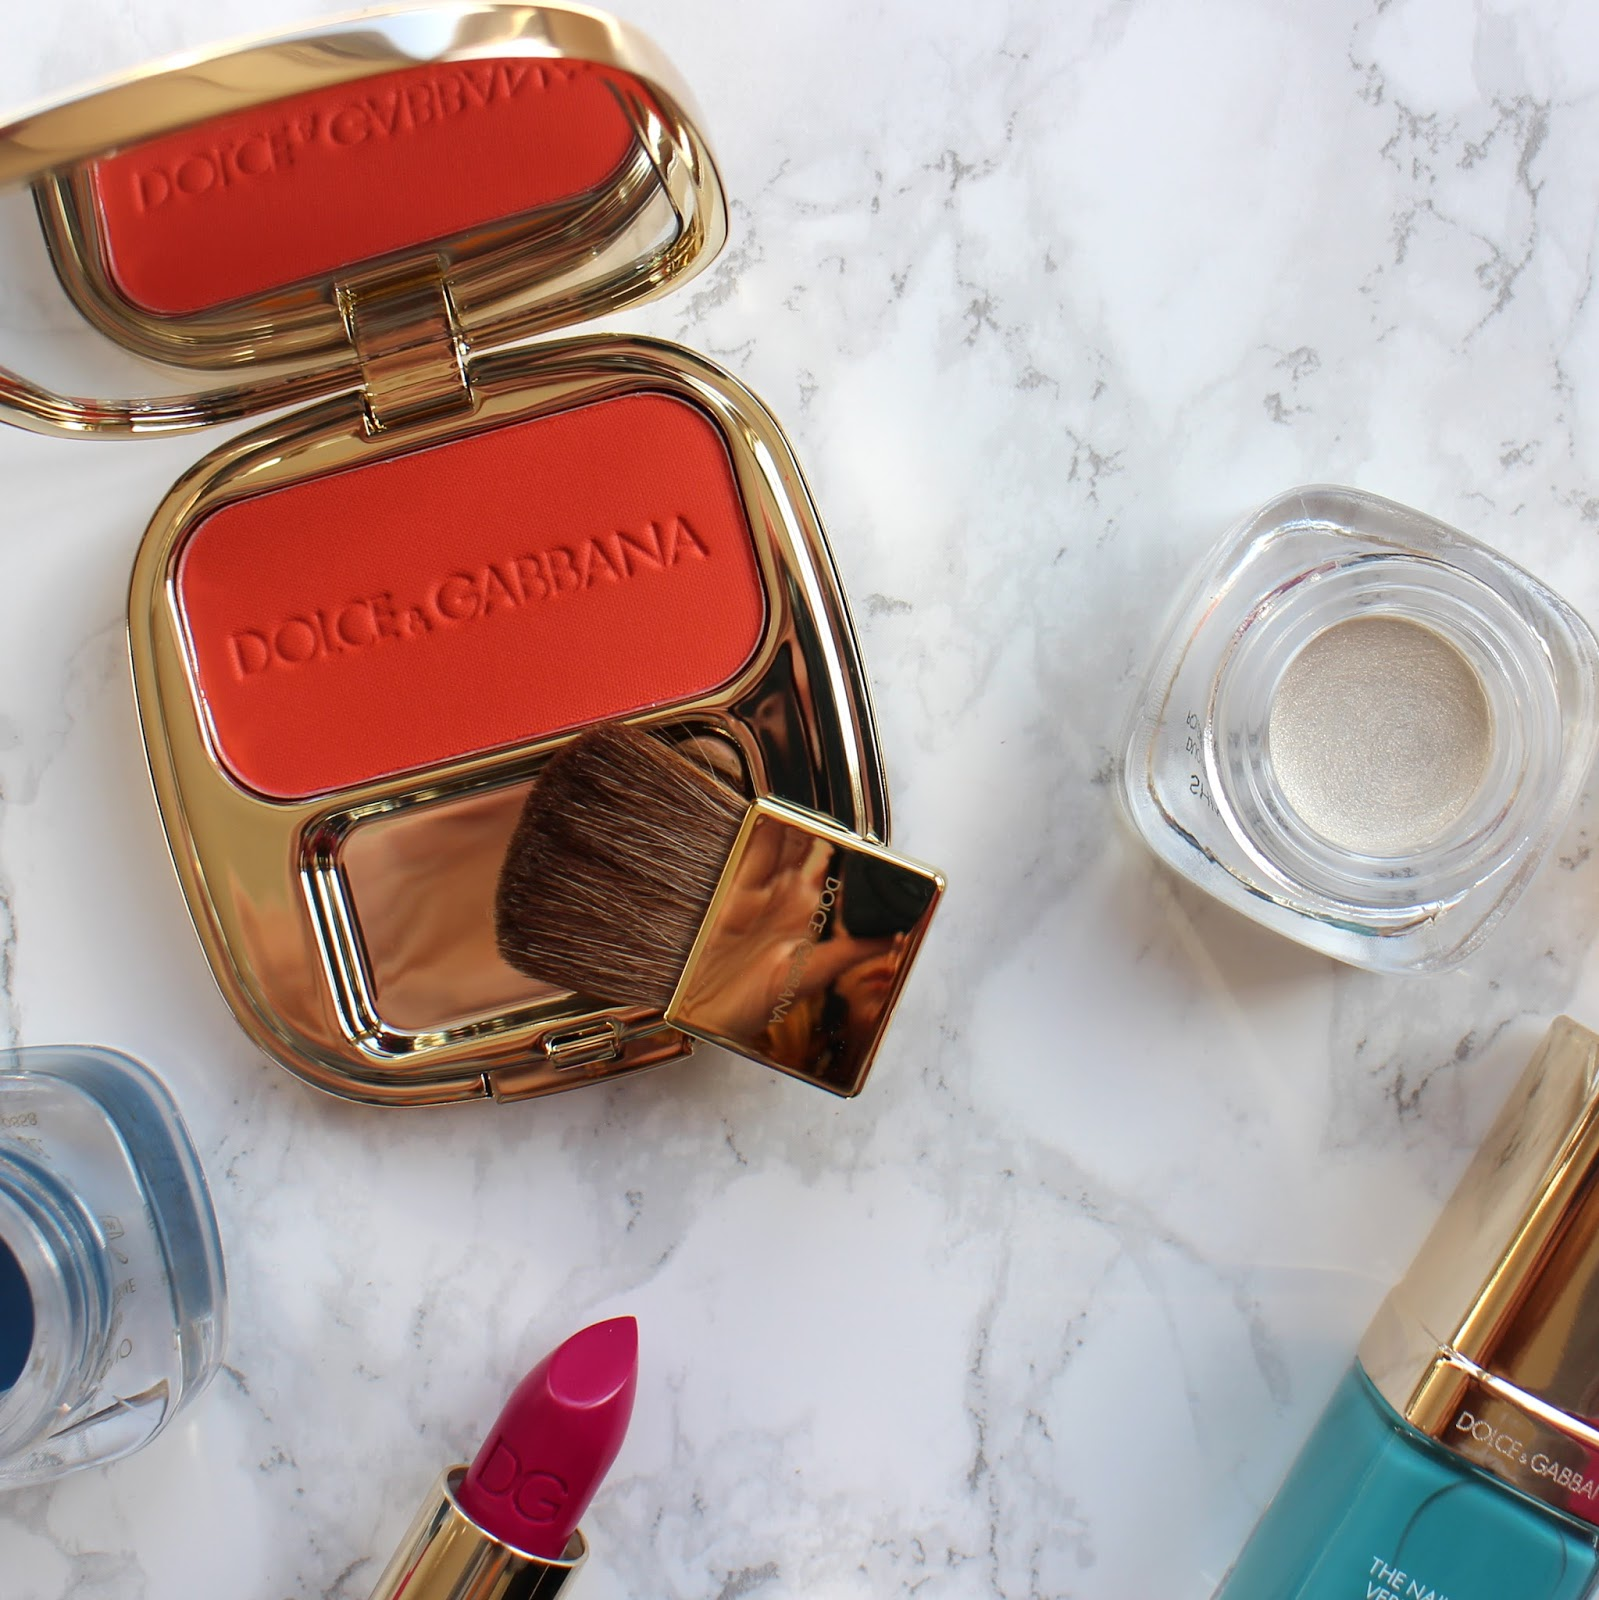 Dolce&Gabbana-Luminous-Cheek-Colour-Blush-Orange,Shimmer-Powder-StarShine-swatches